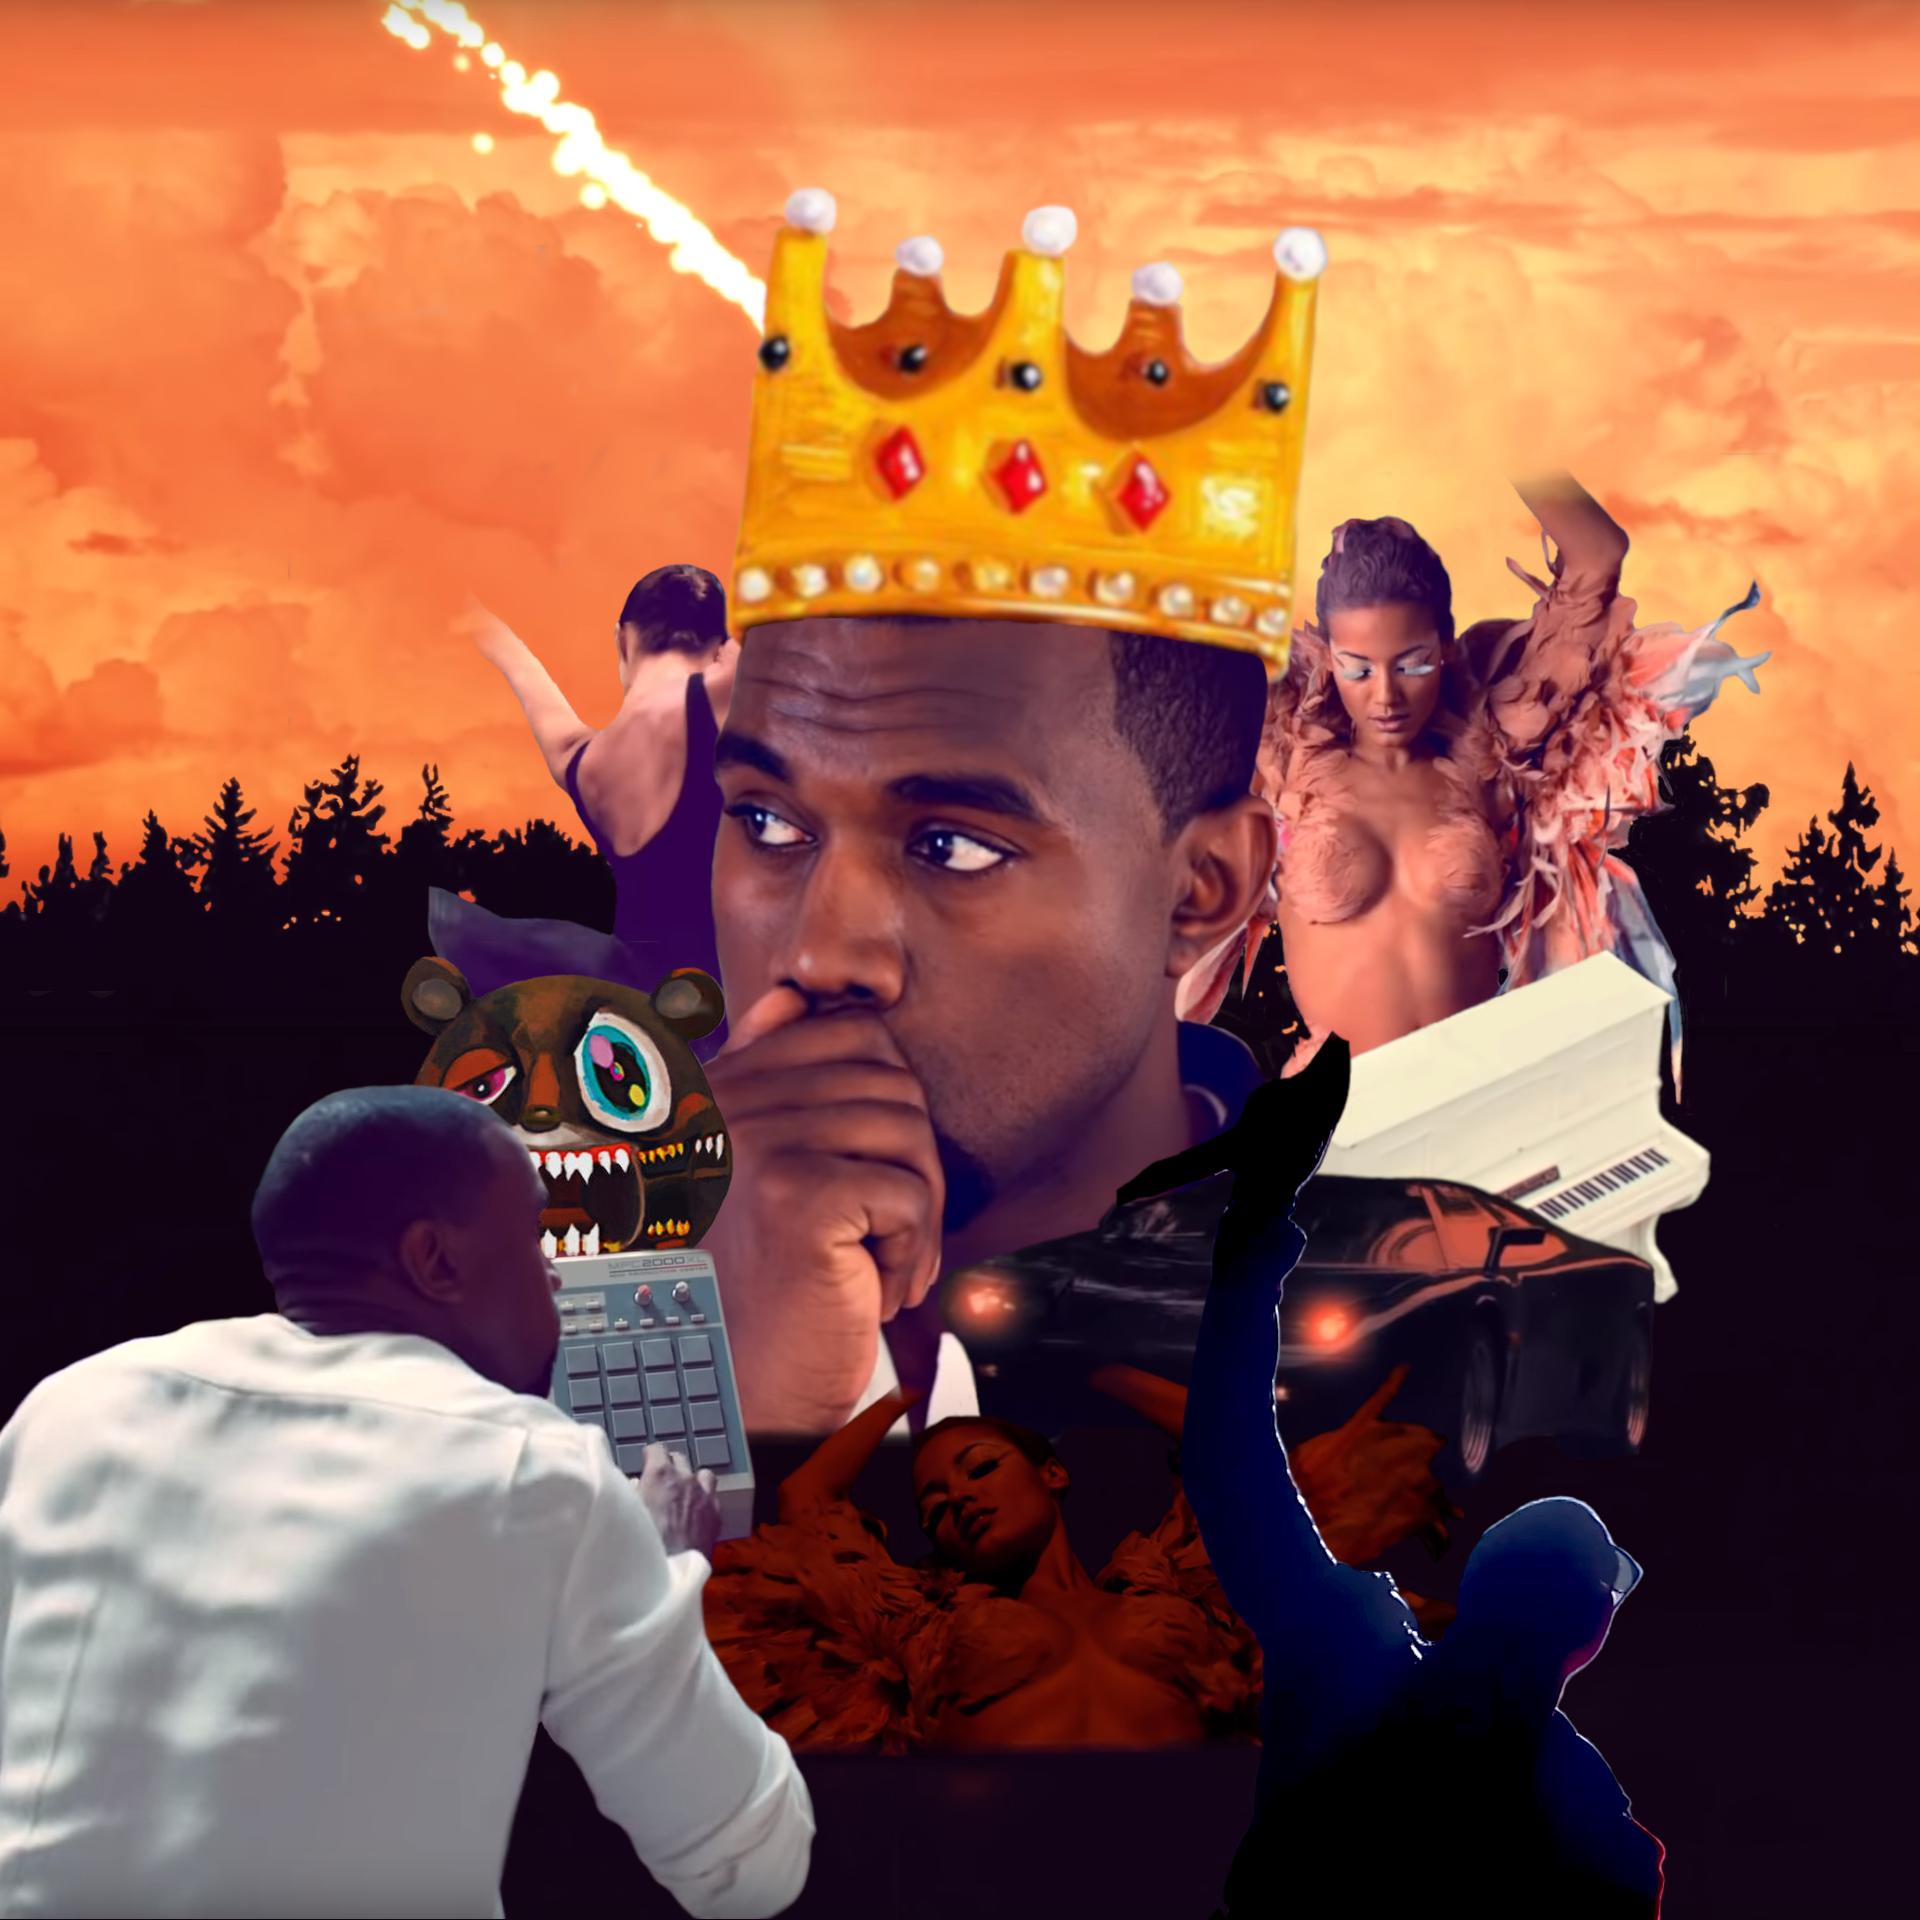 Kanye West My Beautiful Dark Twisted Fantasy Cover Art Poster Chalter Beautiful Dark Twisted Fantasy Album Art Dark And Twisted